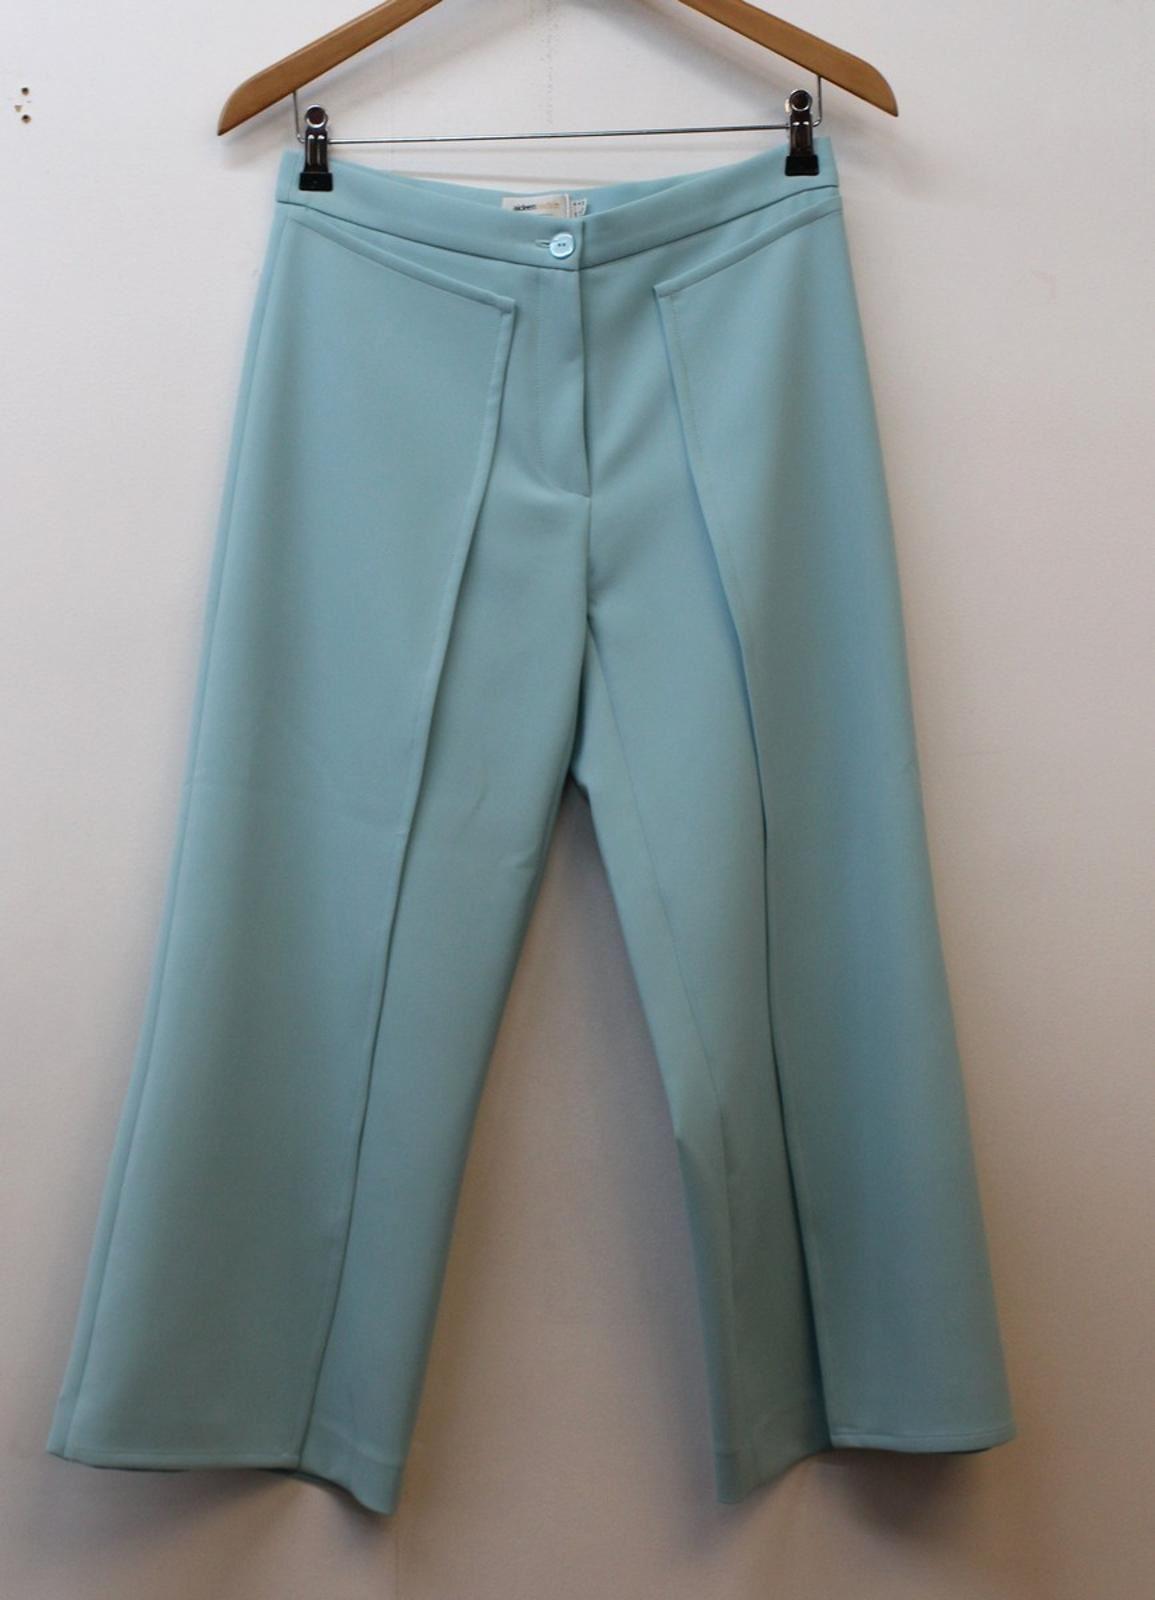 Aideen Bodkin Design Femmes Aqua Bleu Jupe-culotte Pantalon Uk8 Eu36 W28 L24 Bnwt